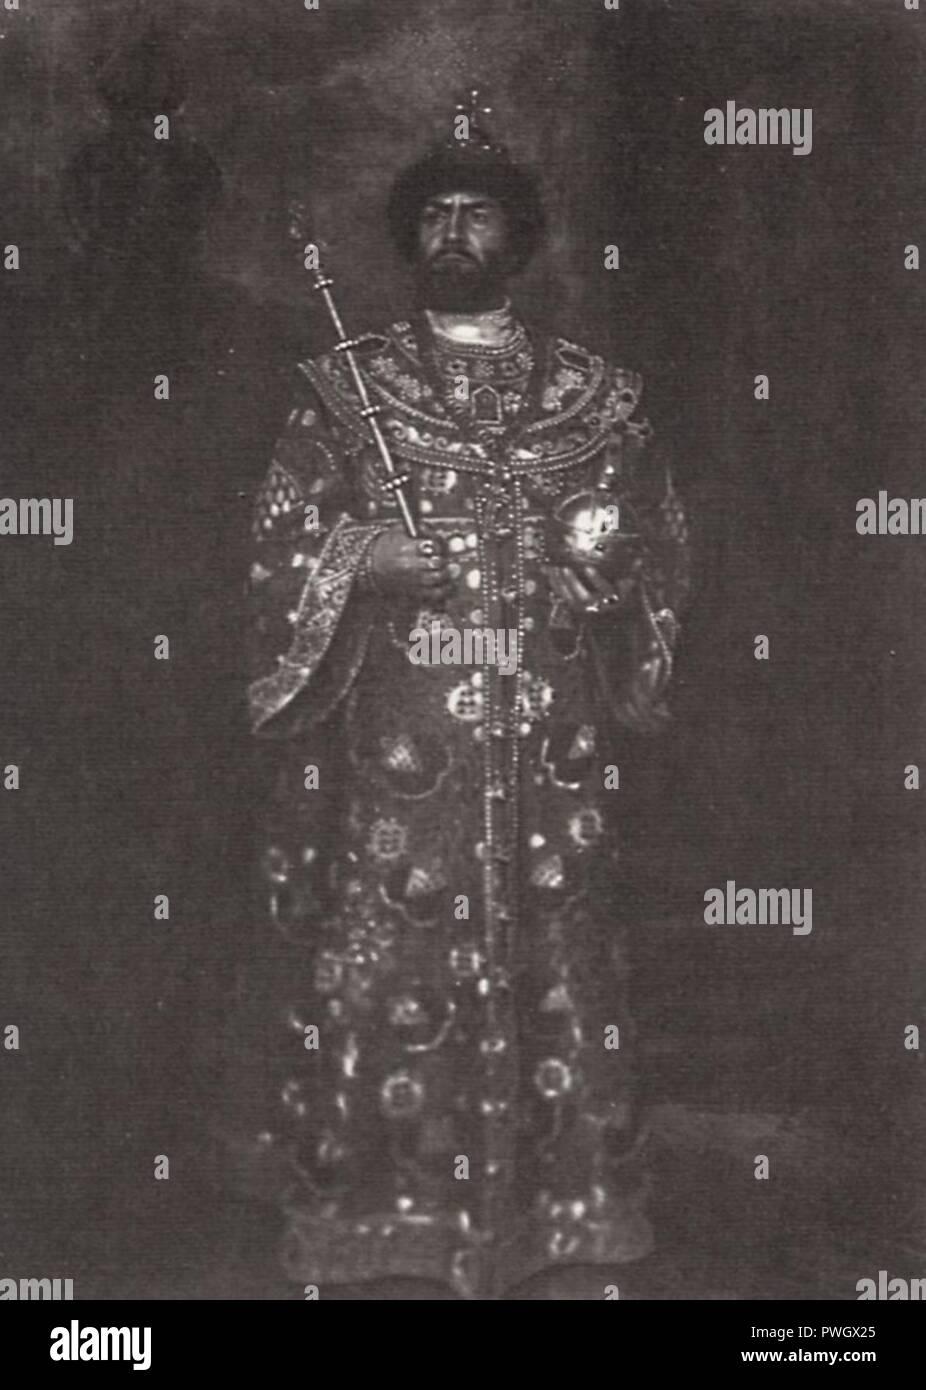 Bulla, Karl Karlovič - Šaljapin als Boris Godunov, St. Petersburg - Stock Image